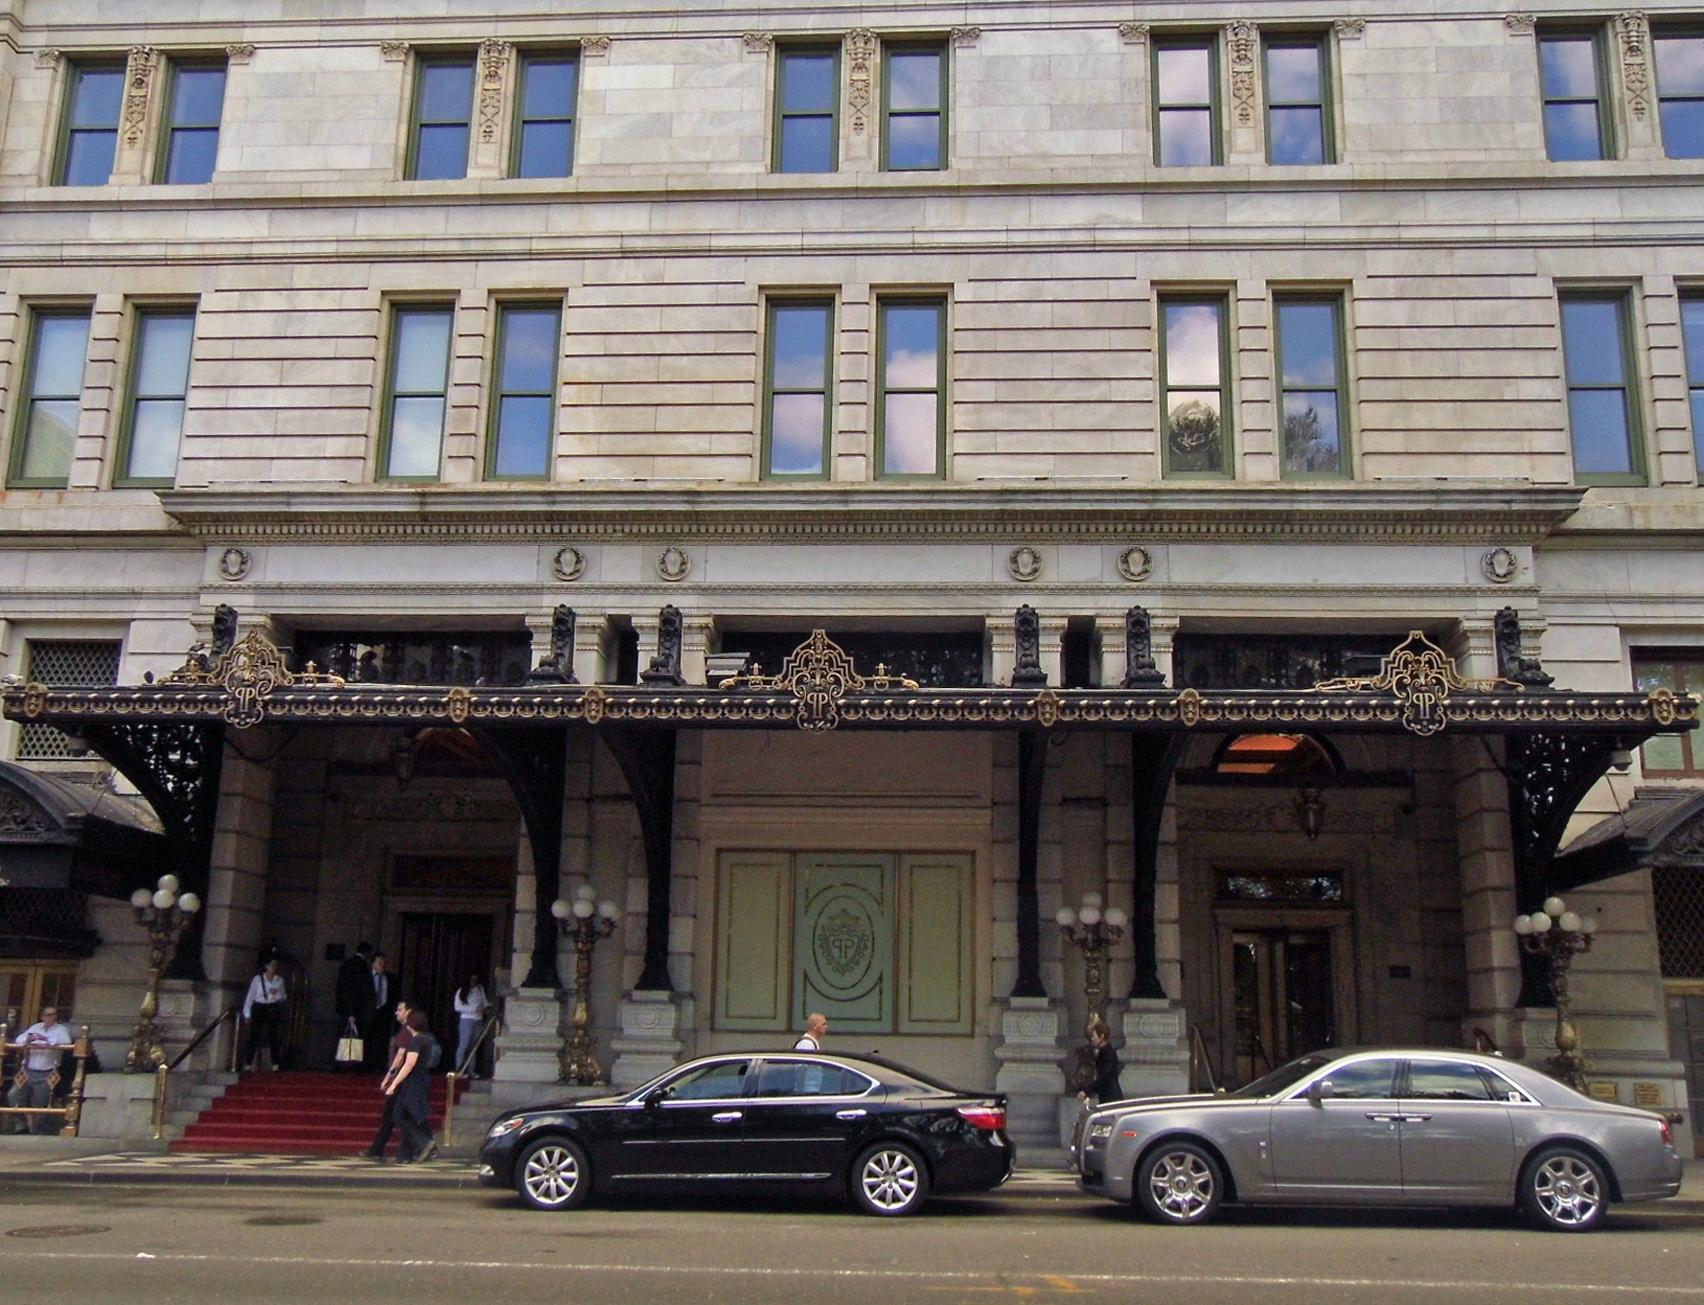 FileThePlaza Hotel West 59th St Entrance